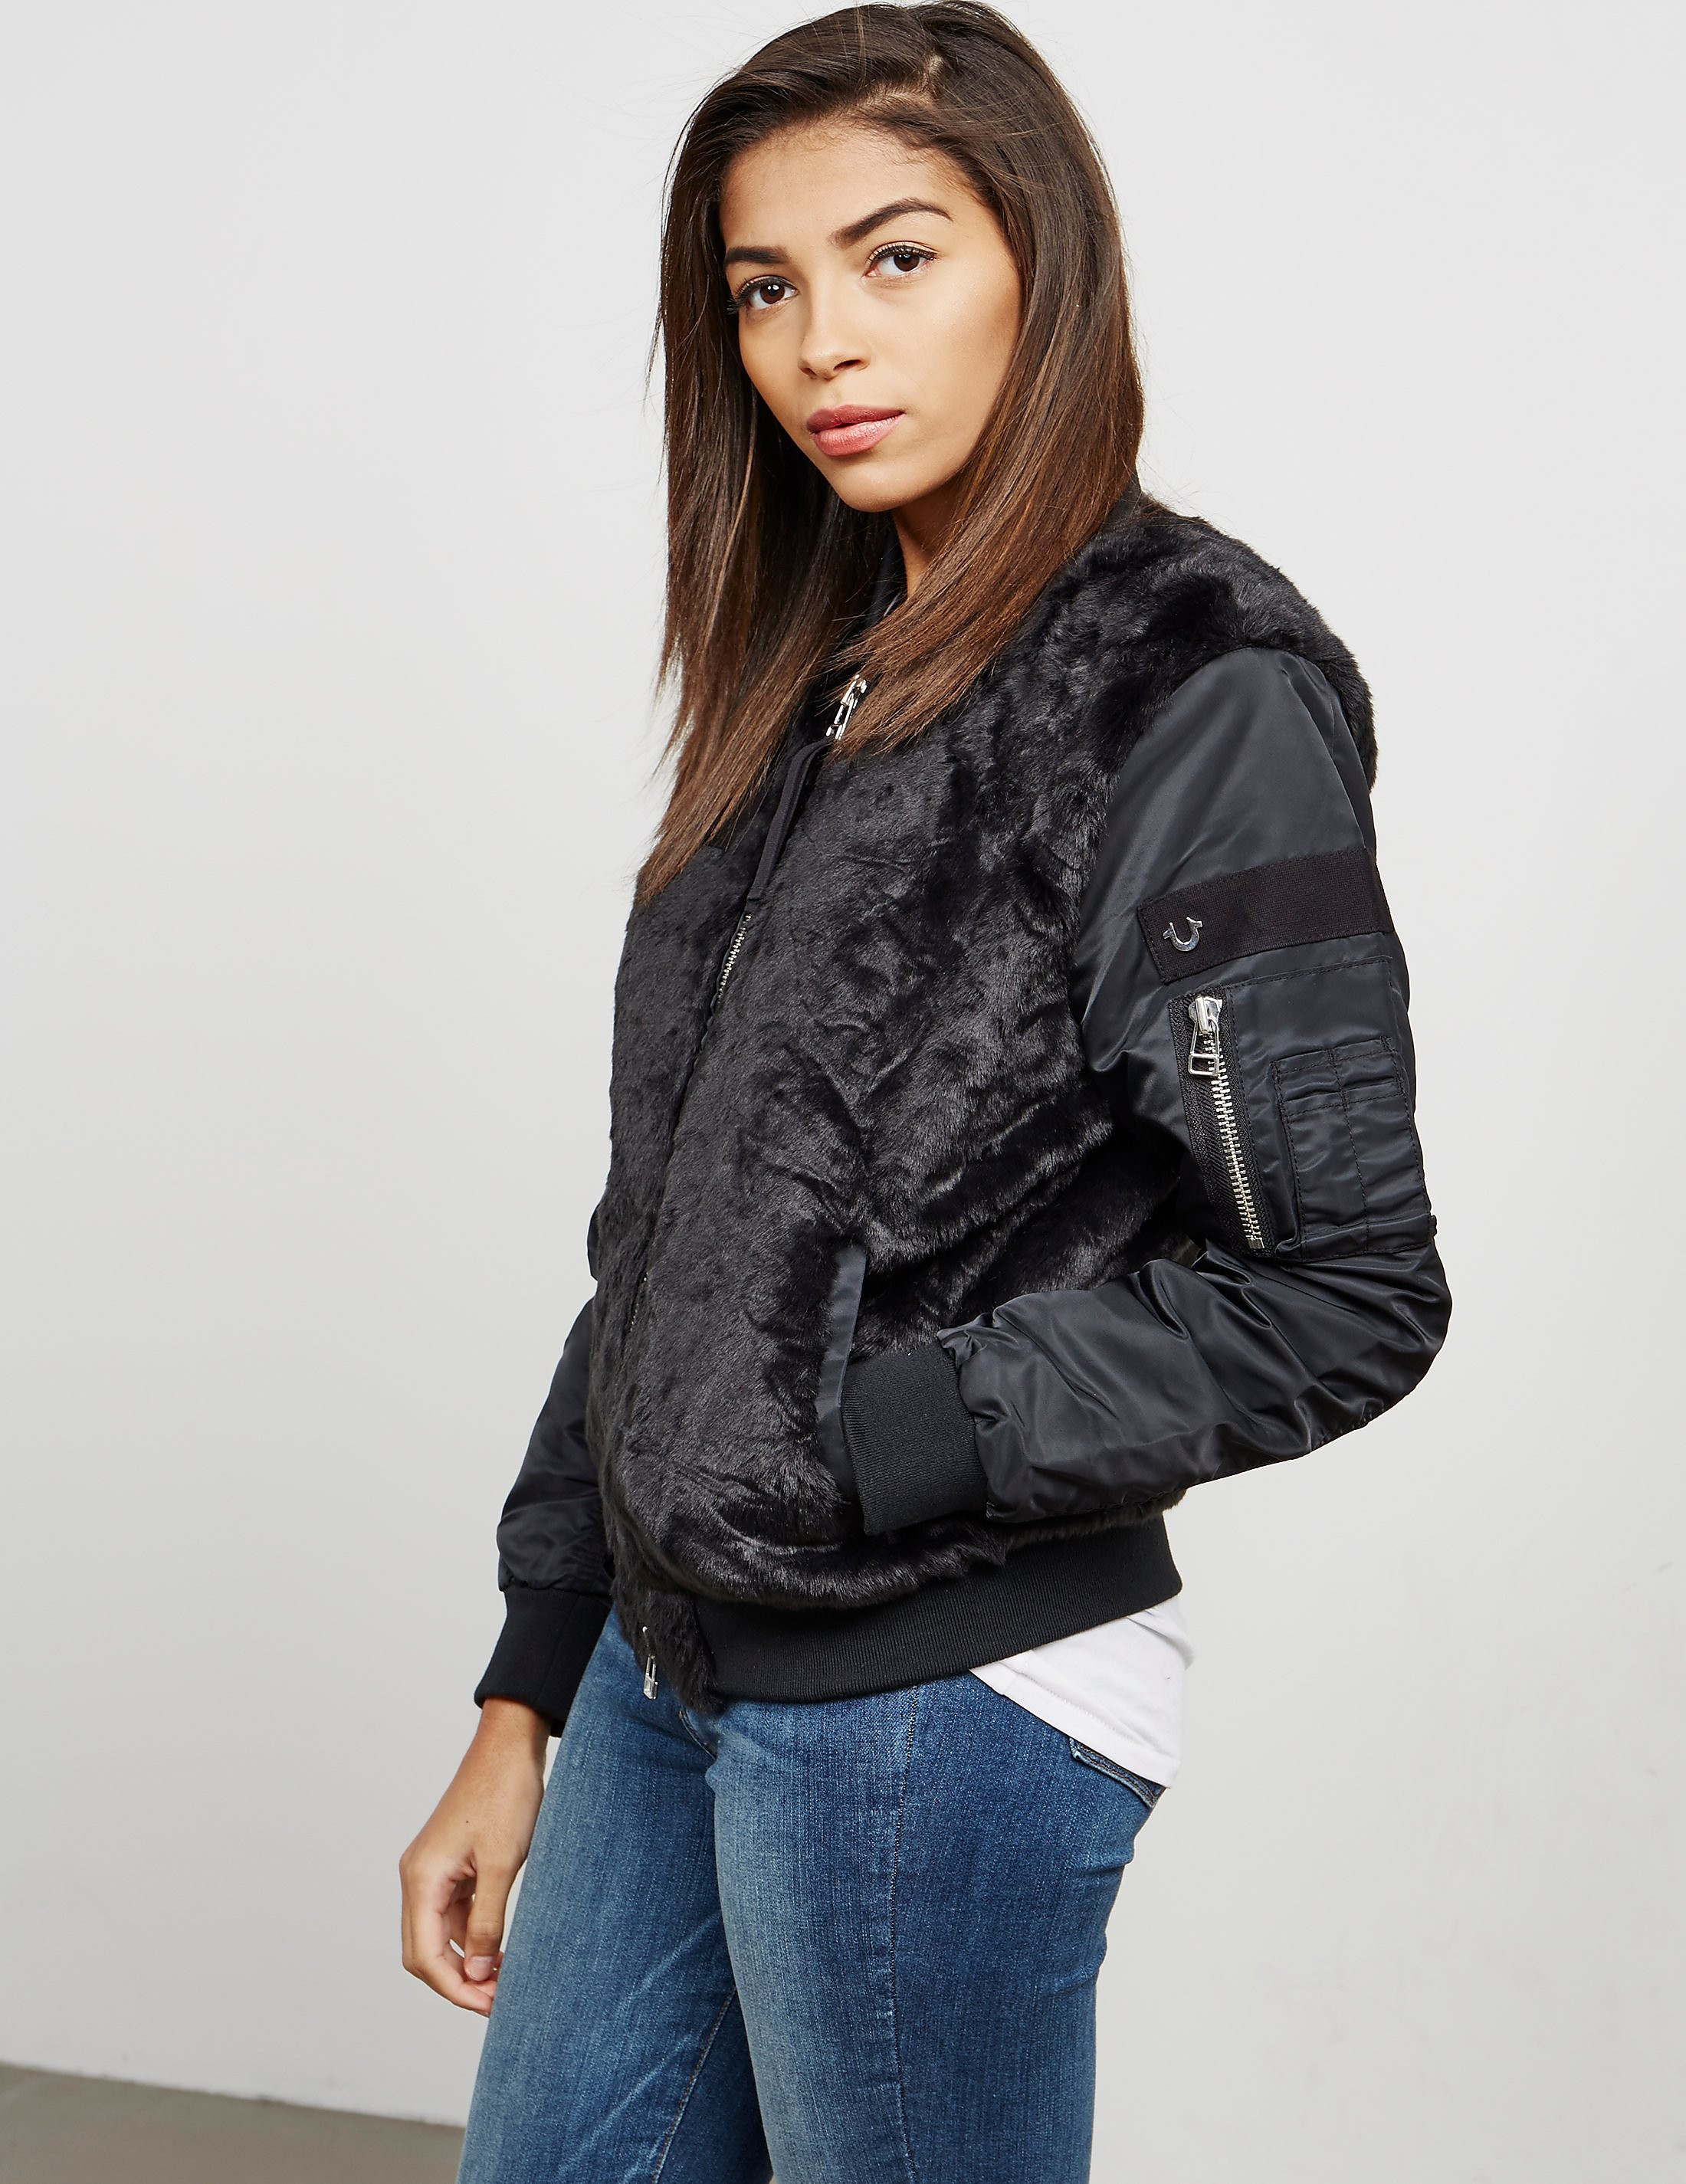 True Religion Faux Fur Bomber Jacket